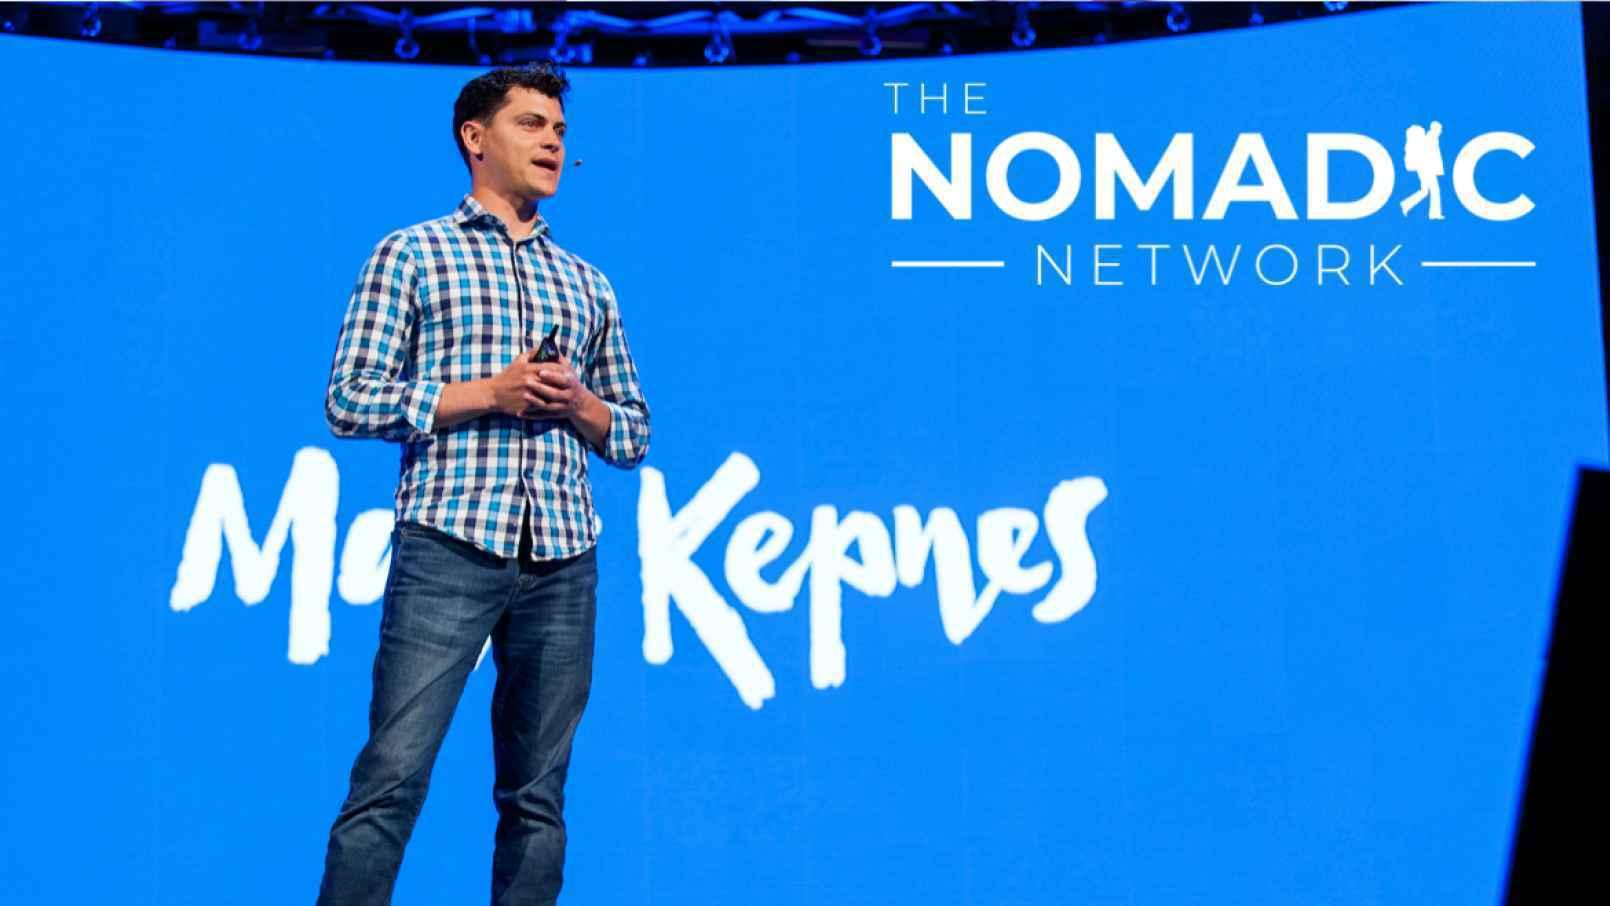 Noamdic Matt speaking at a conference